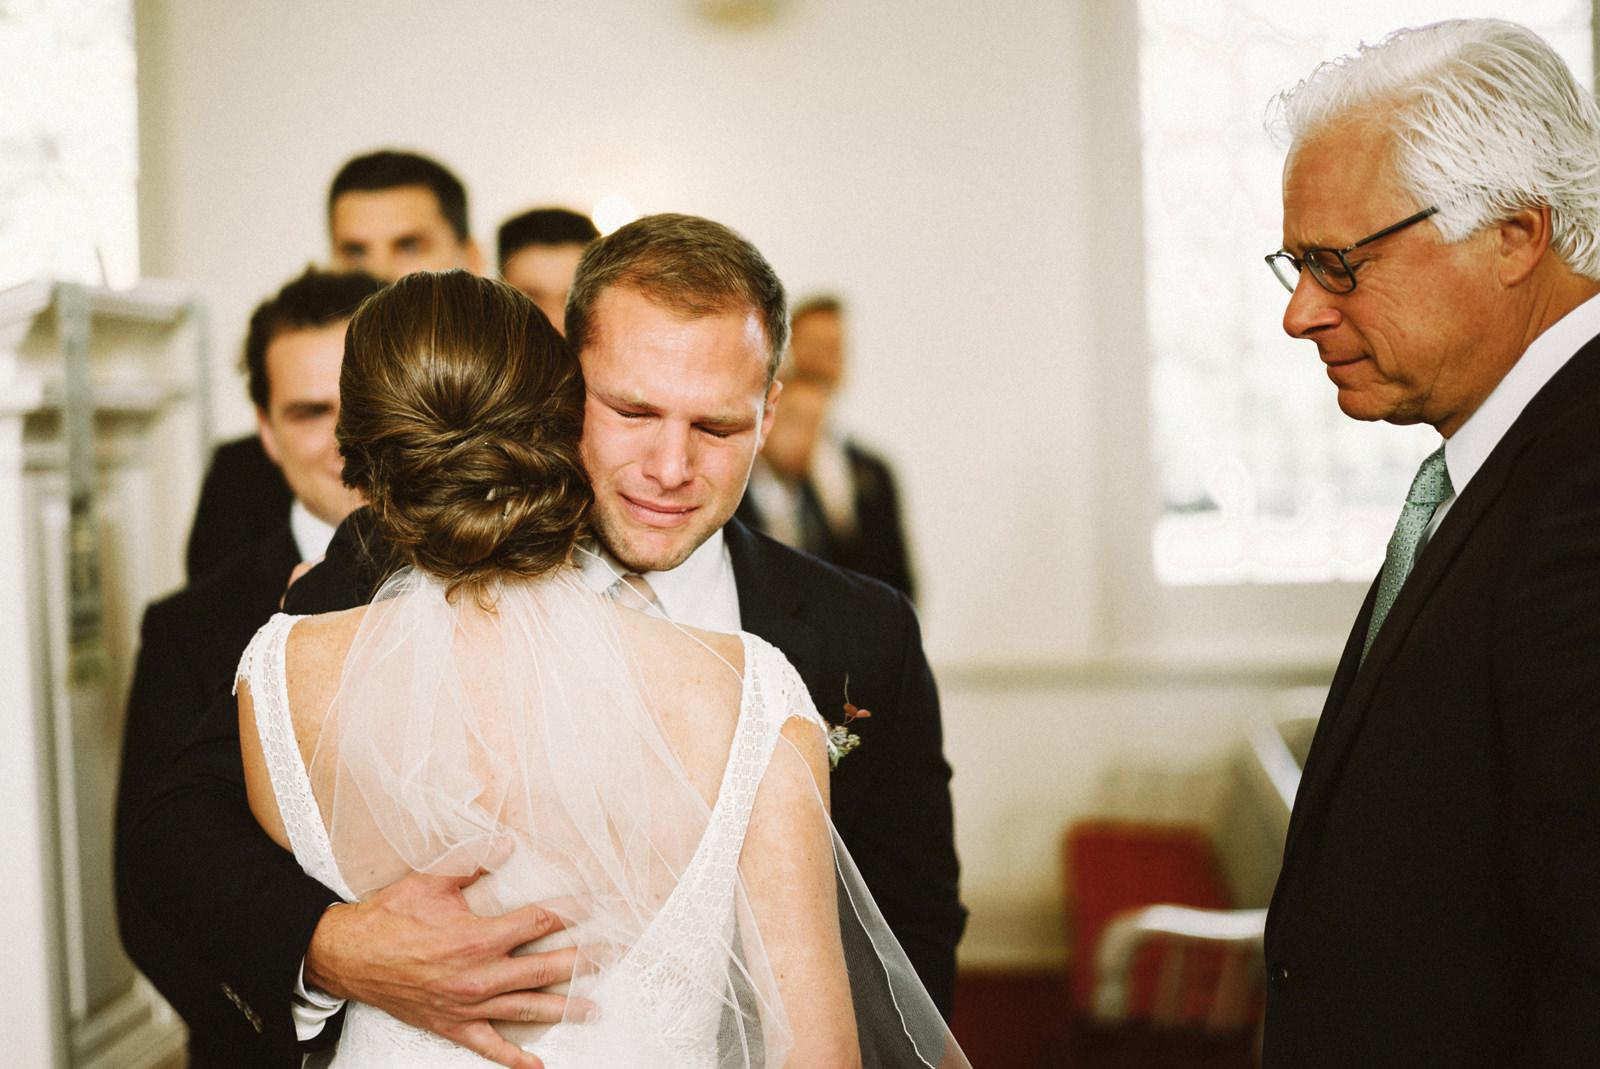 bridgeport-wedding-053 BRIDGEPORT, CONNECTICUT BACKYARD WEDDING